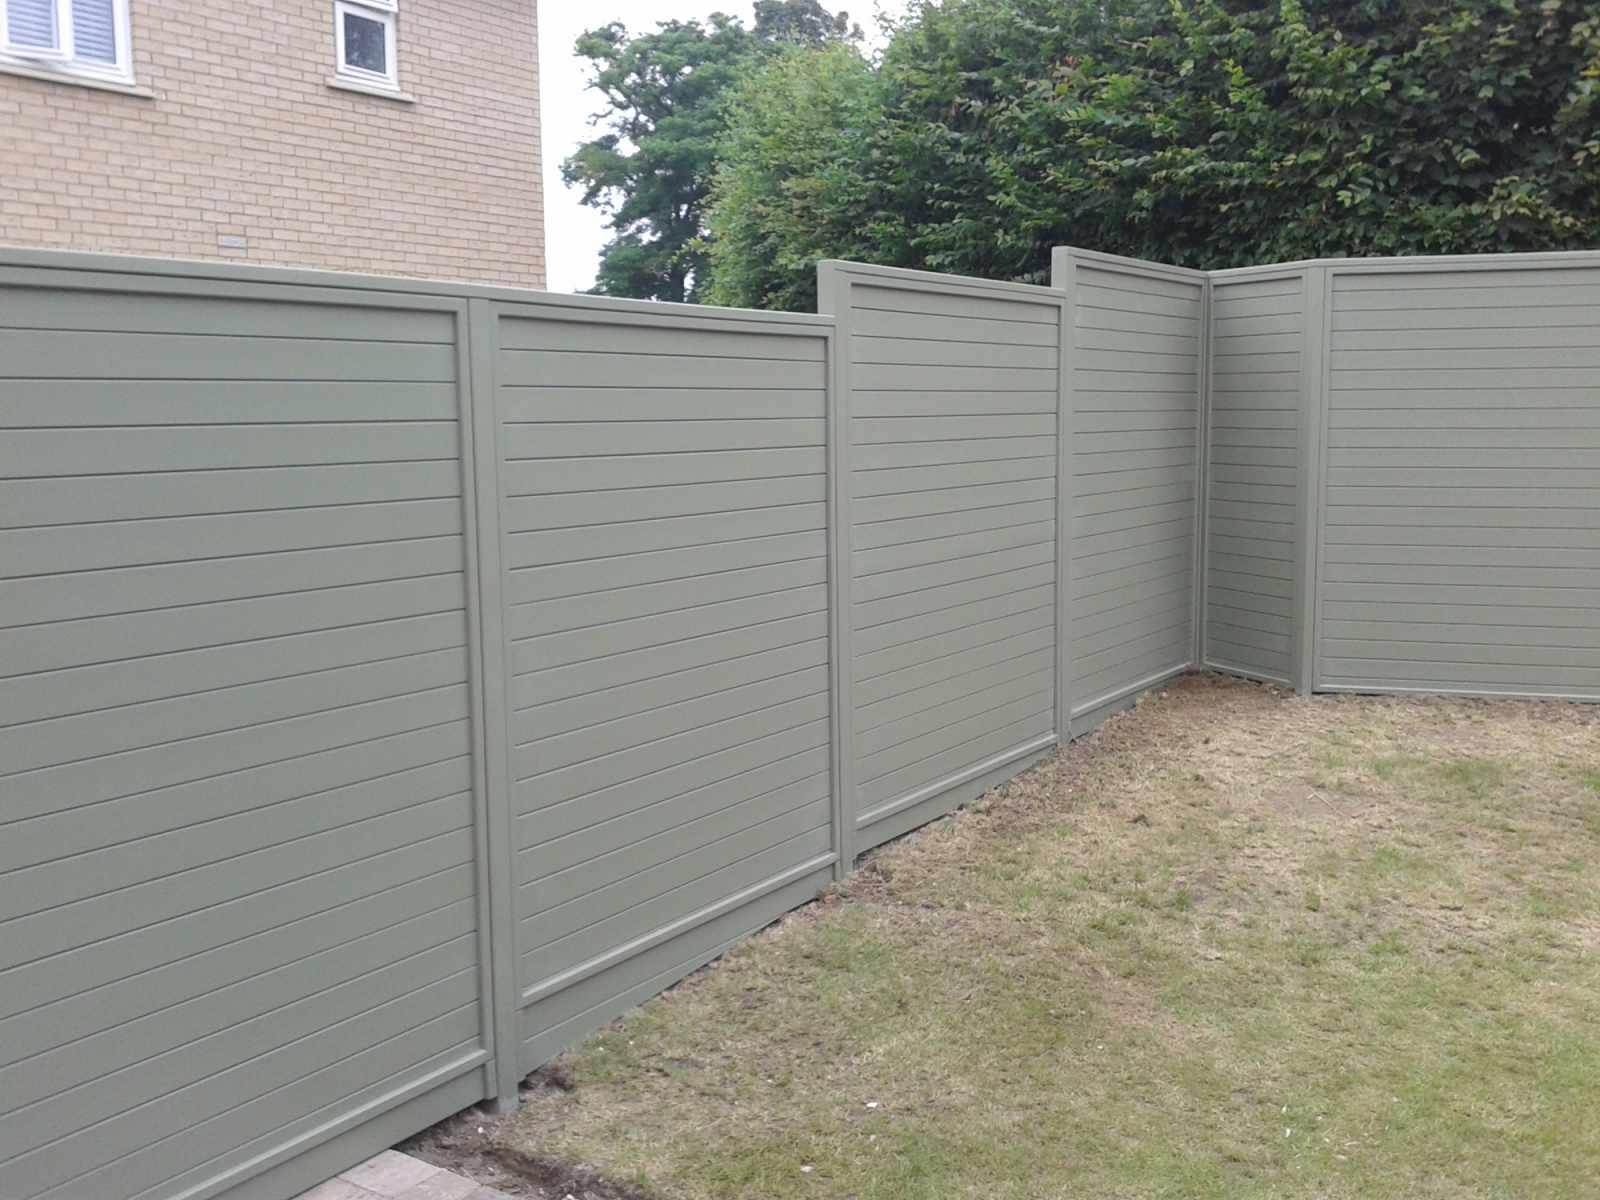 Decorative Fence Panels | Essex UK | The Garden Trellis ...